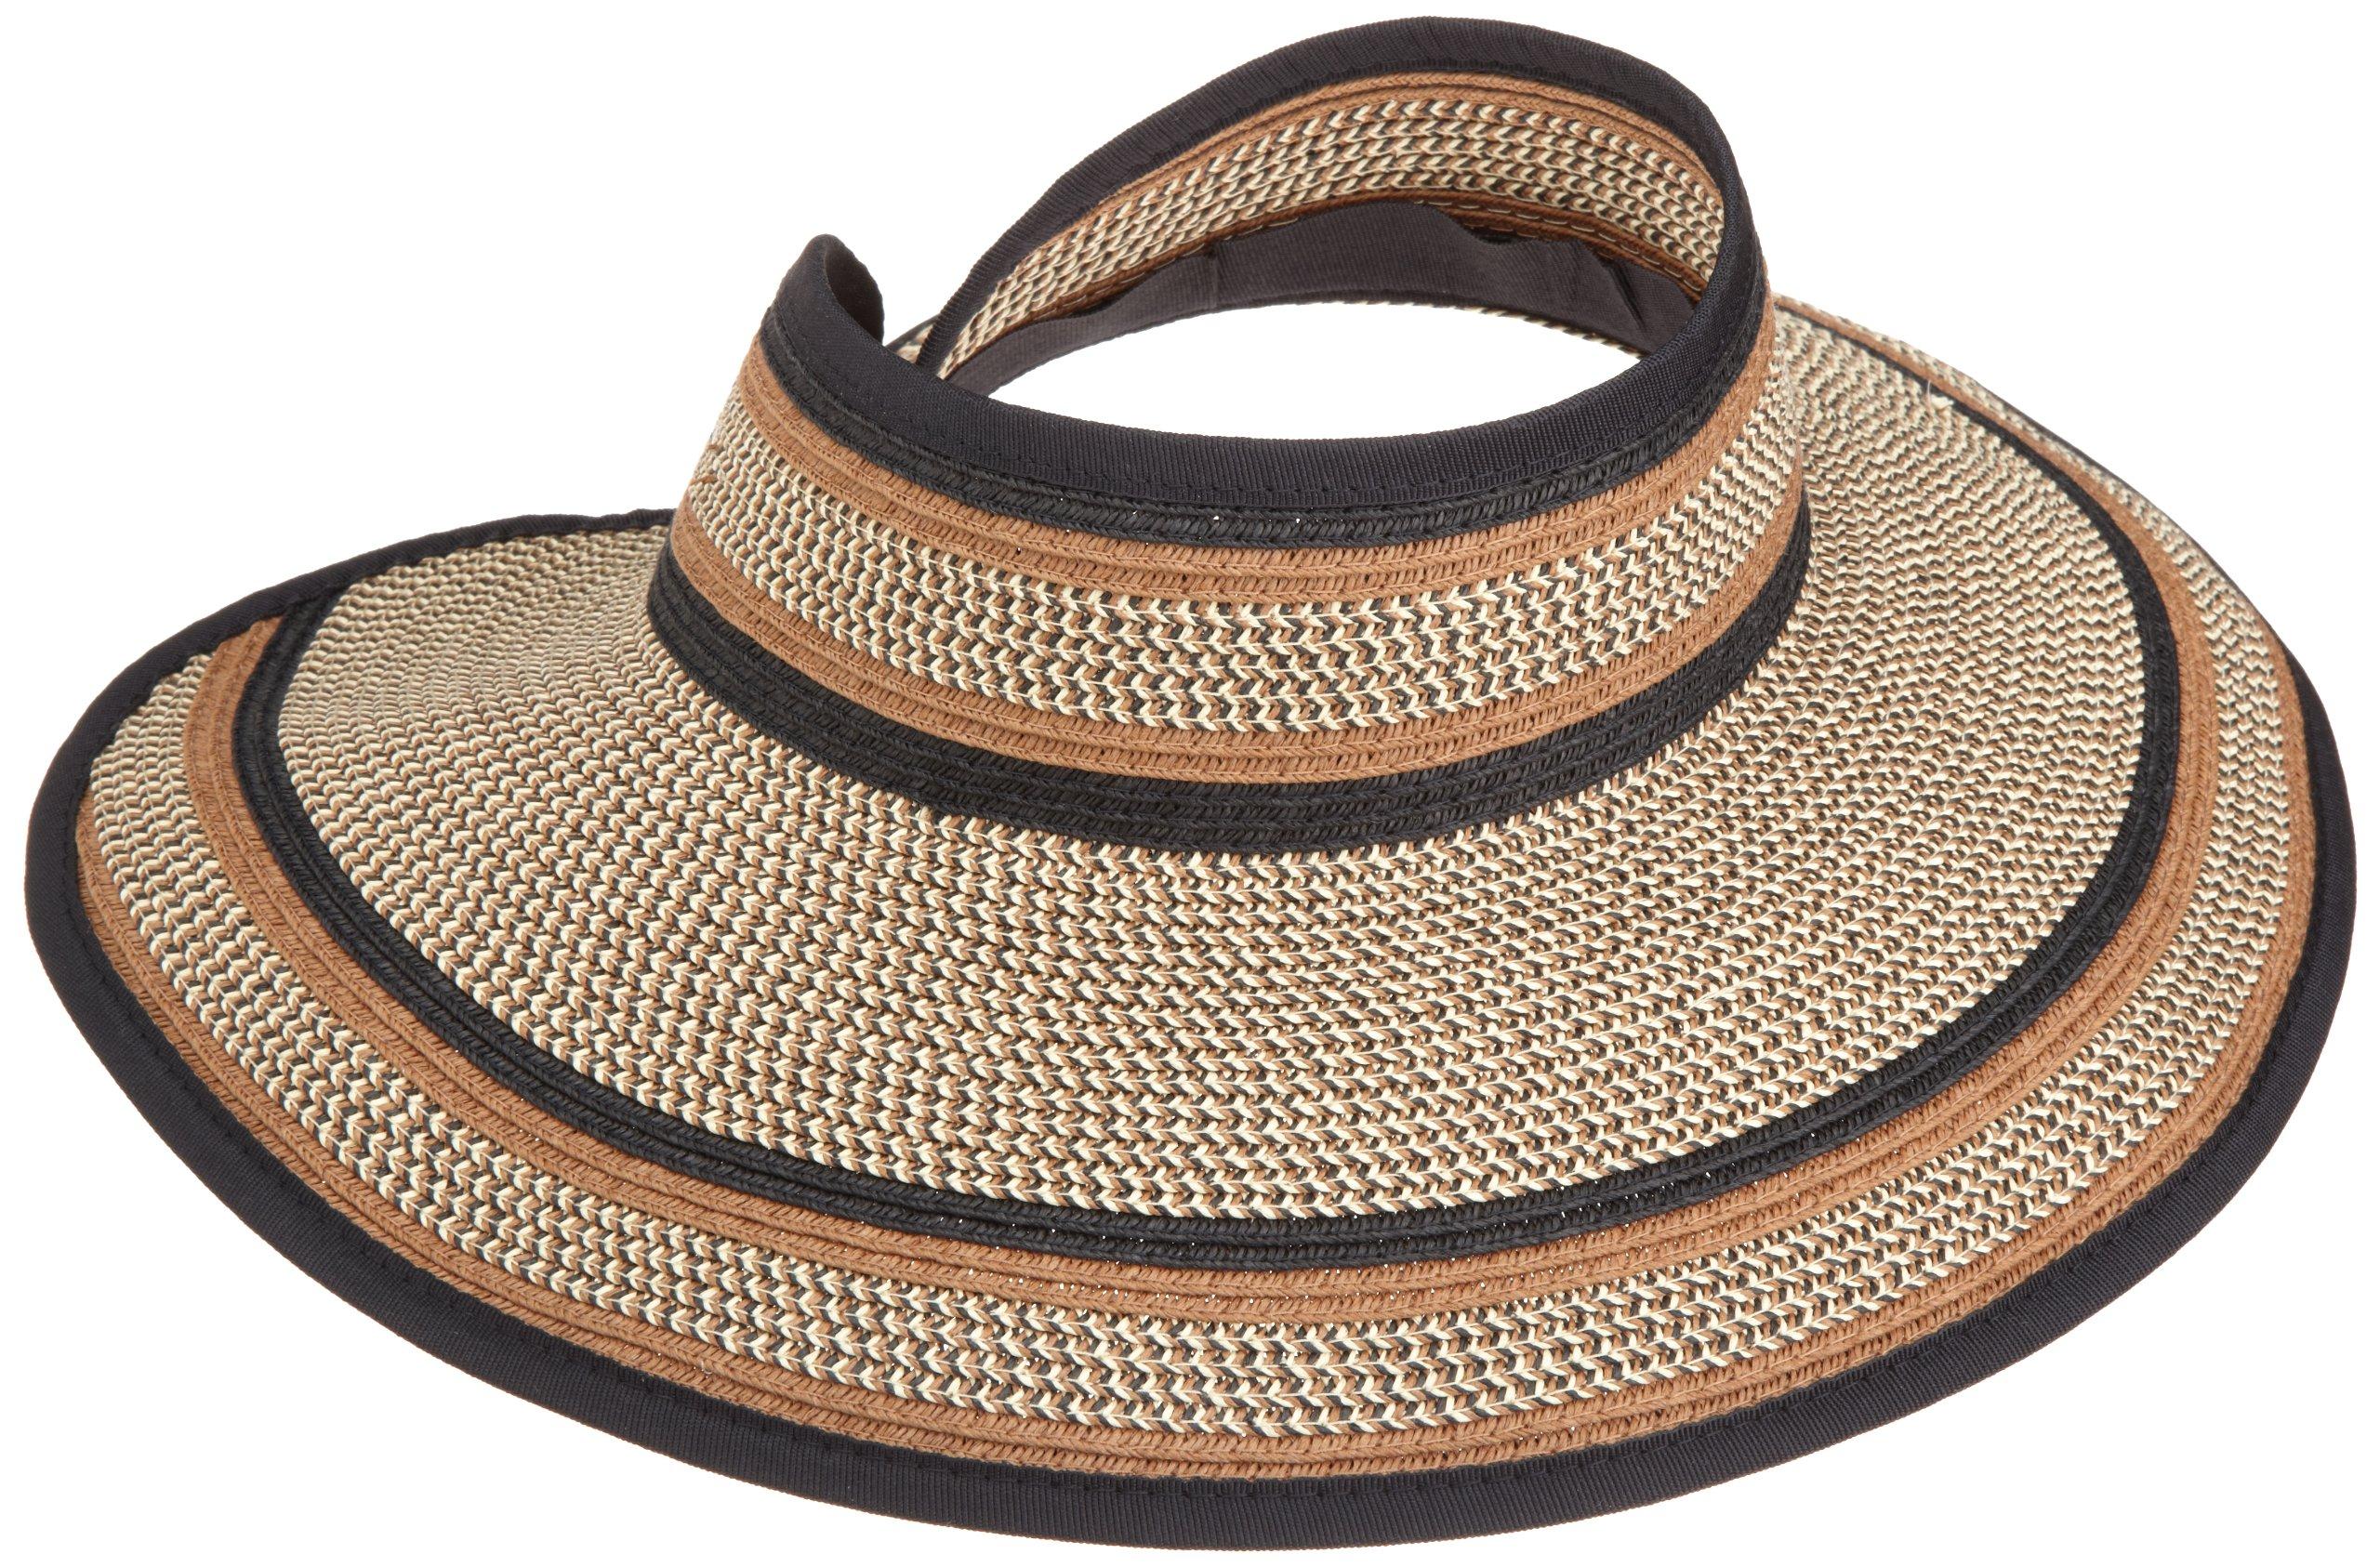 San Diego Hat Company Women's Ultrabraid Visor Hat,Mixed Brown,One Size